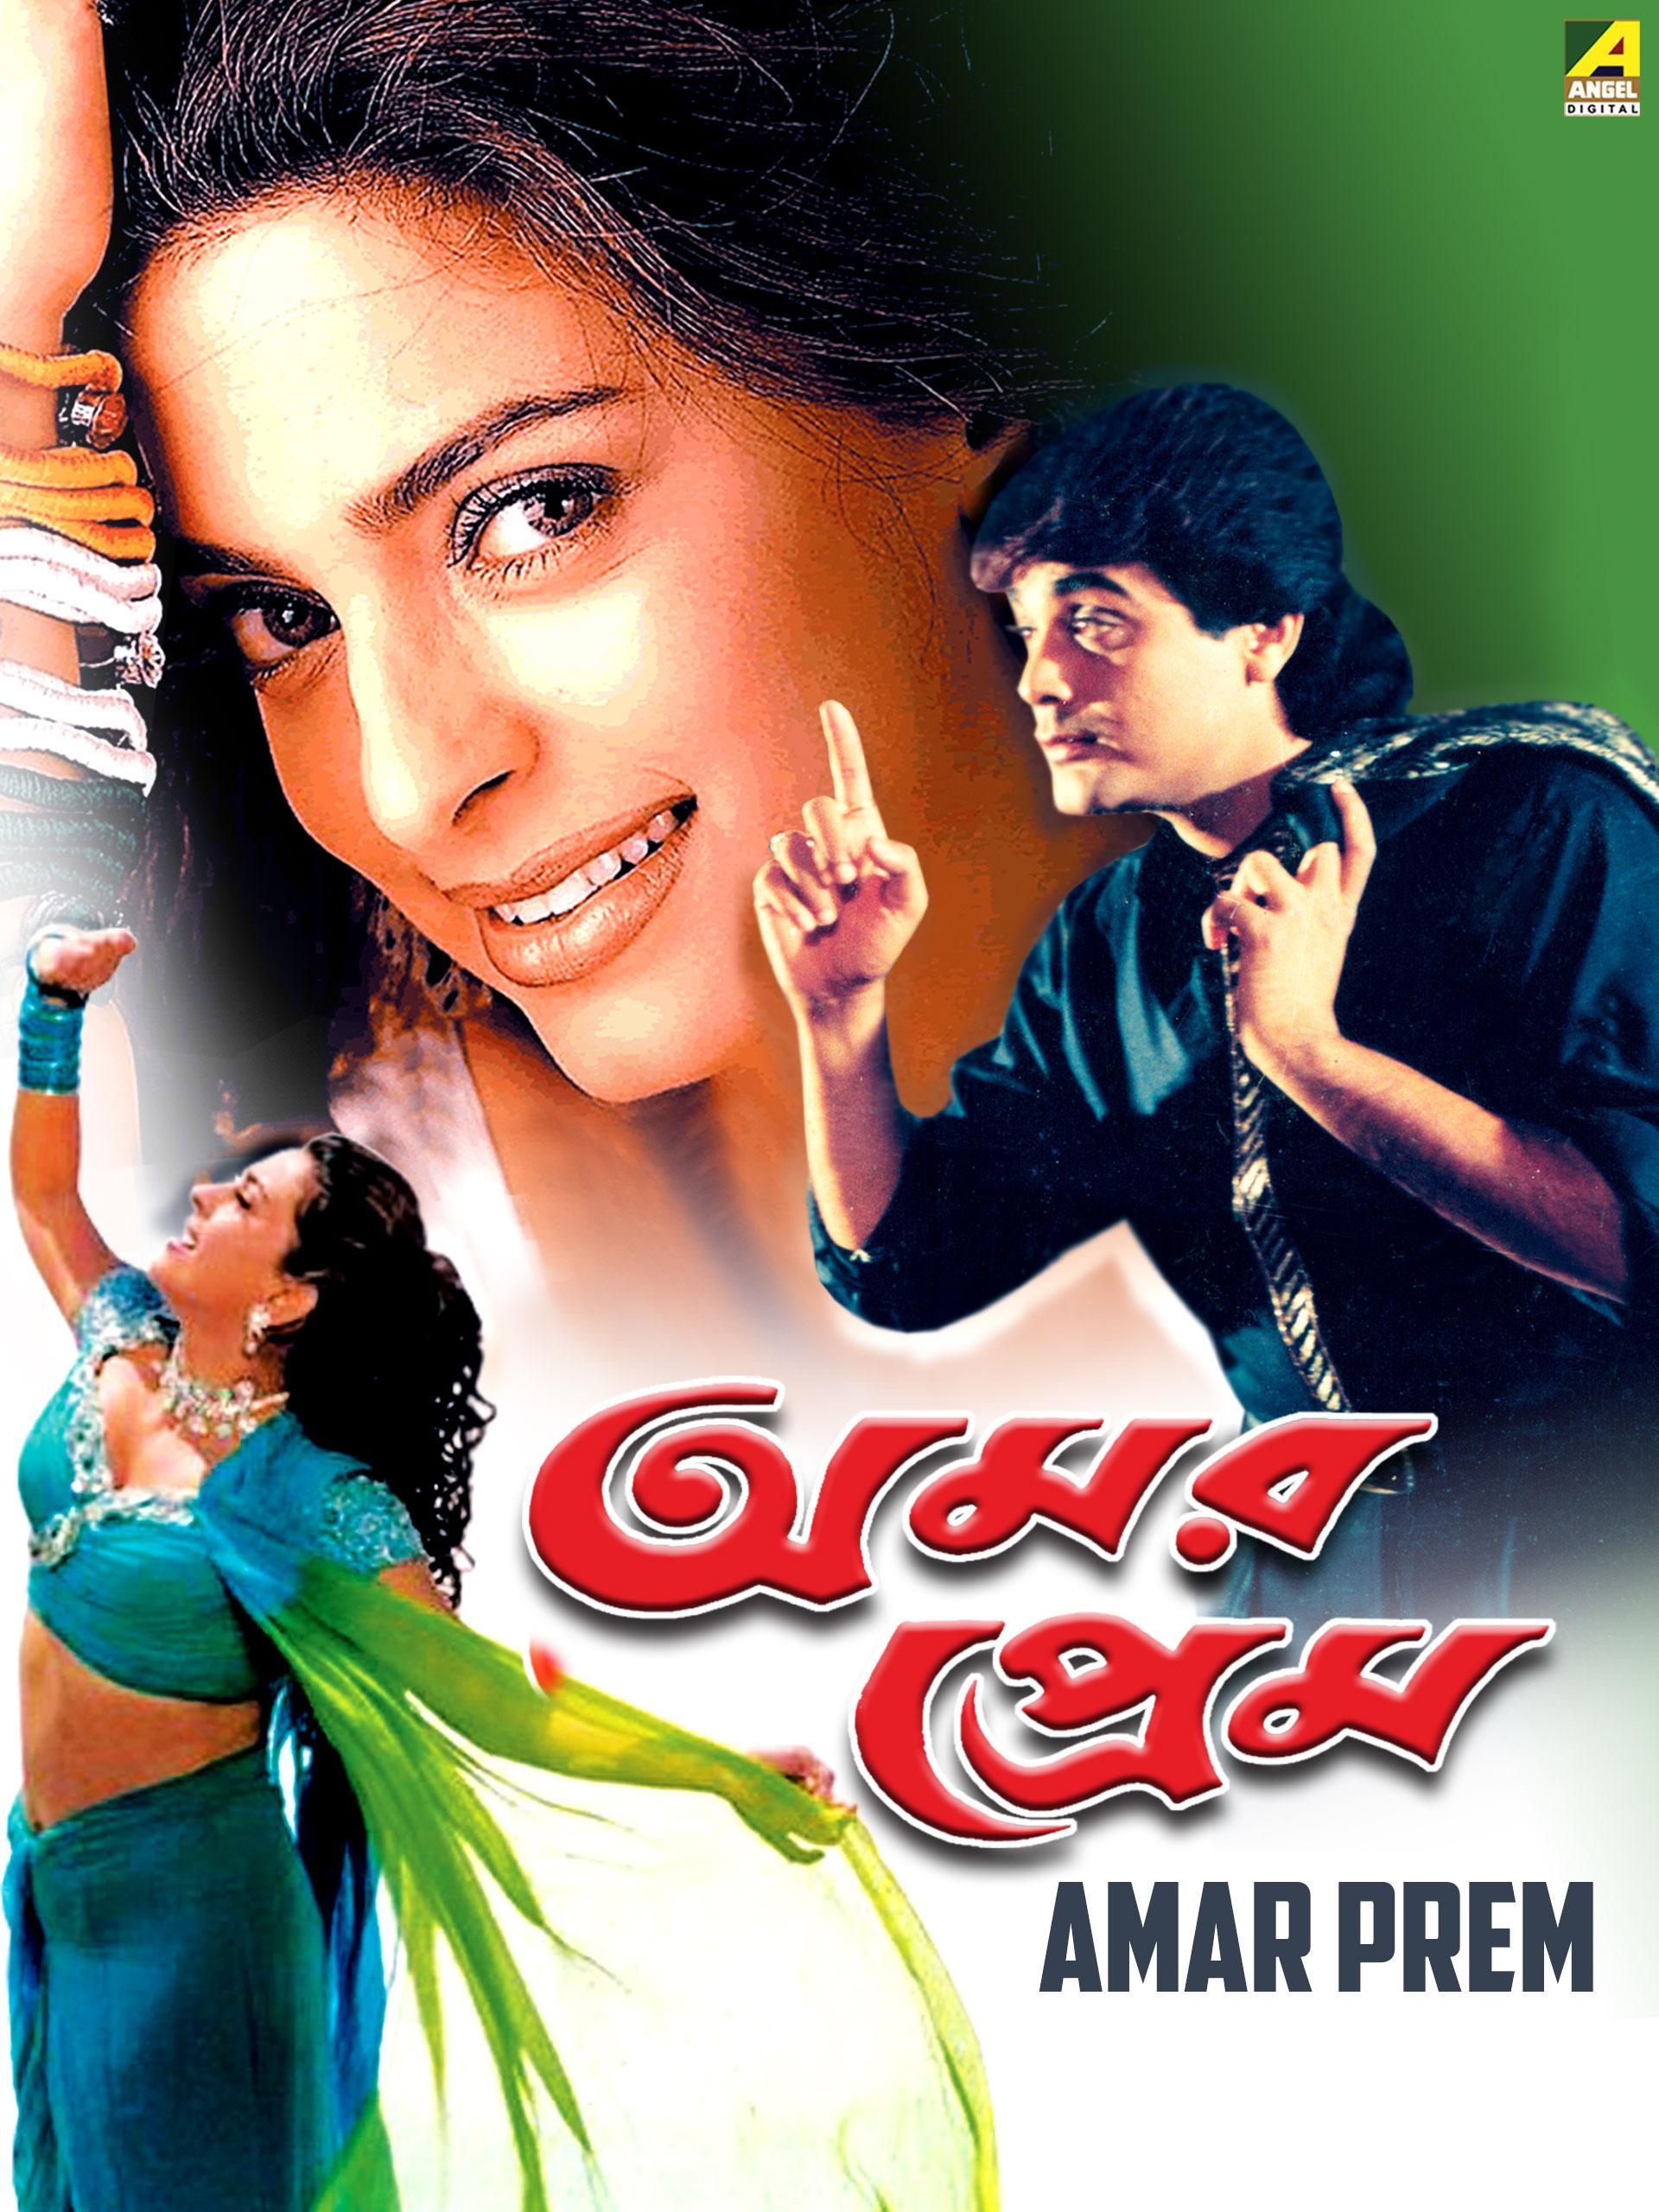 Amar Prem ((1989))